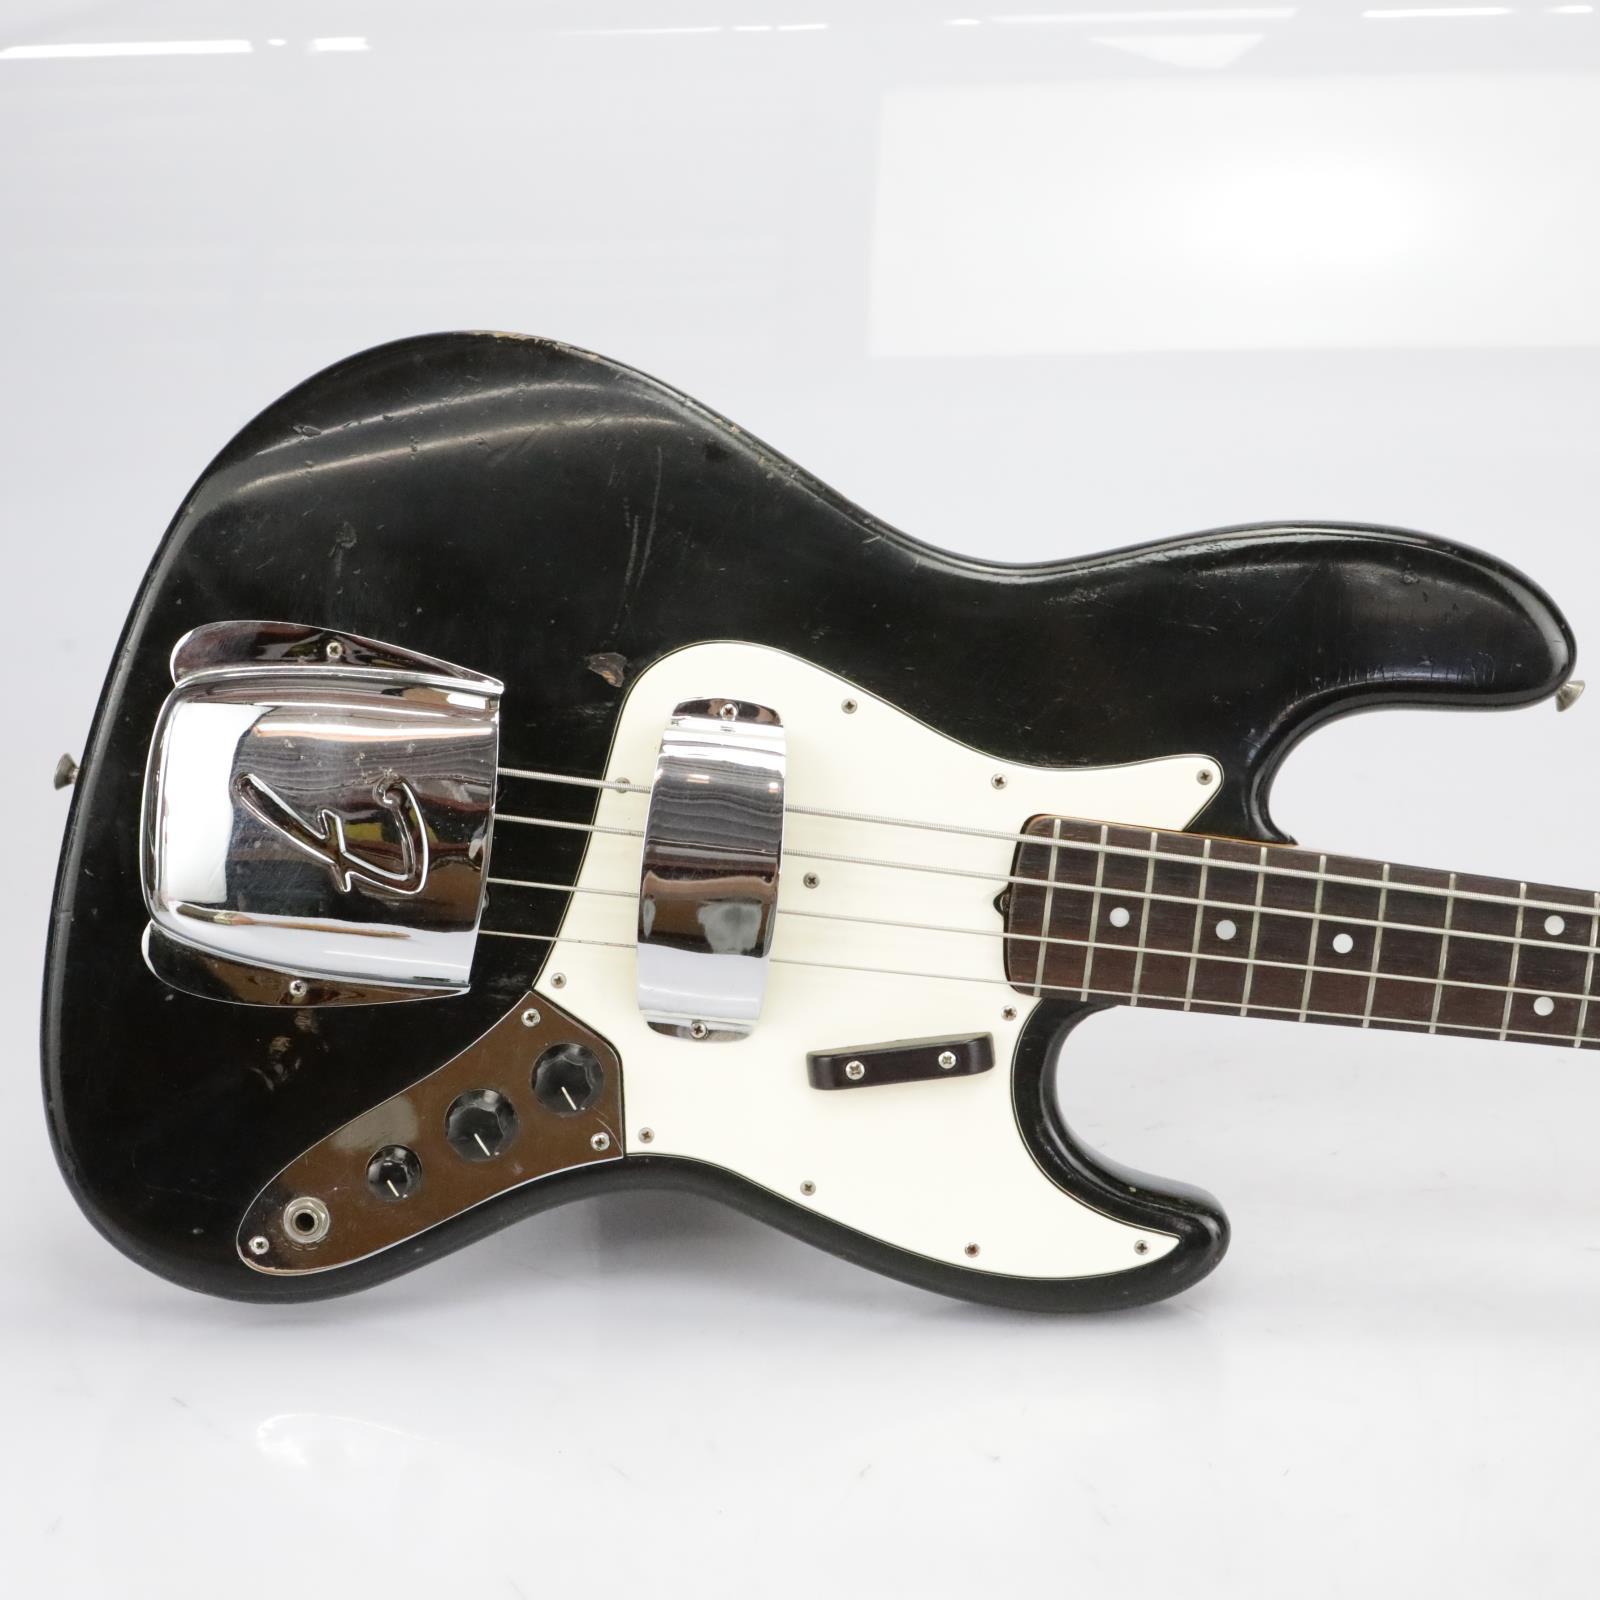 1964 Fender Jazz Bass Guitar Black Refinish #40189